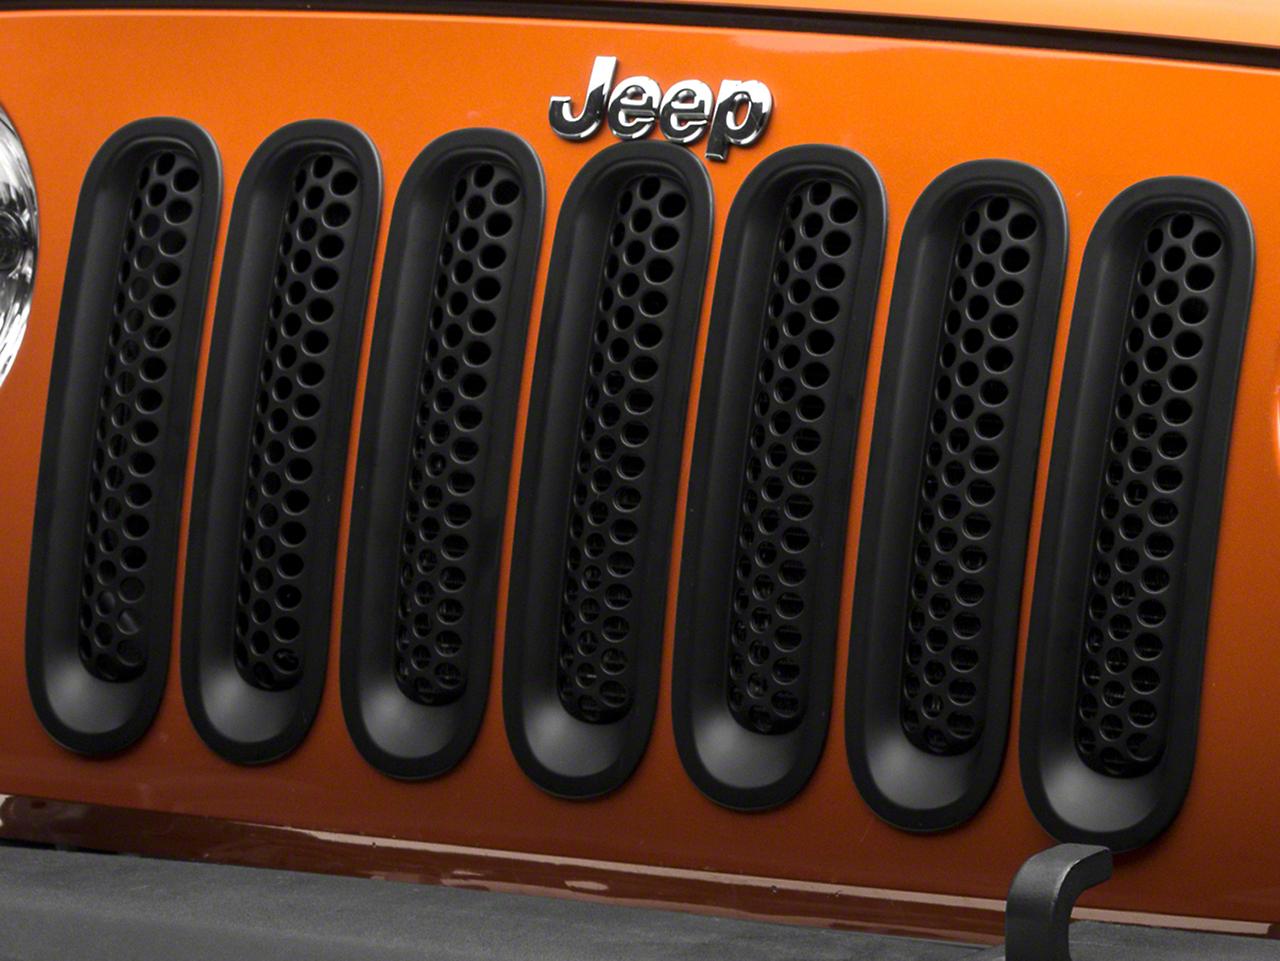 RedRock 4x4 Mesh Grille Inserts - Matte Black (07-18 Jeep Wrangler JK)